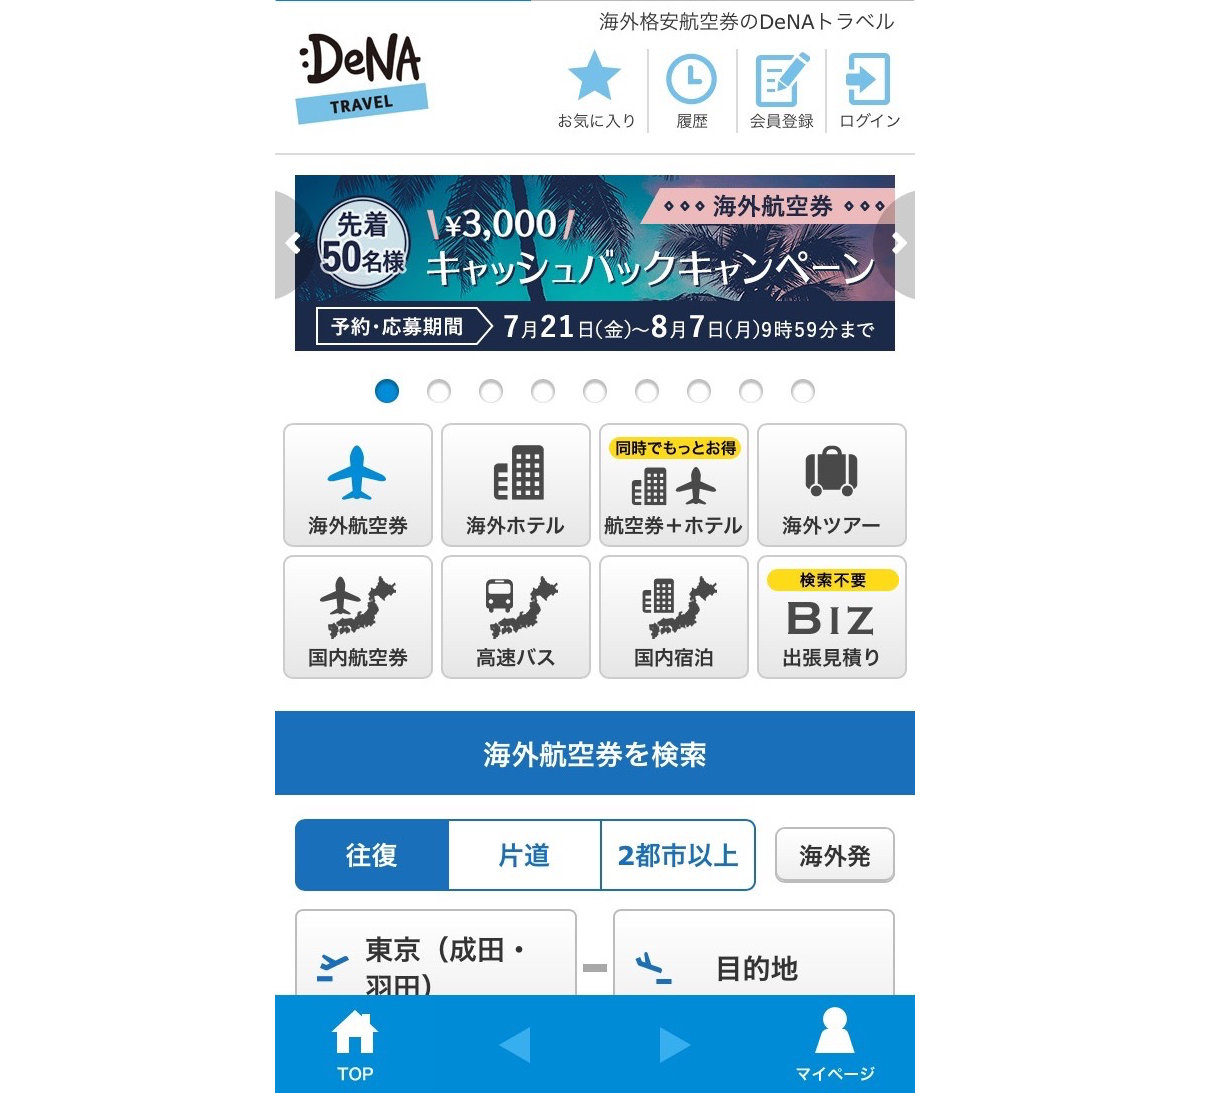 DeNAトラベルのアプリ